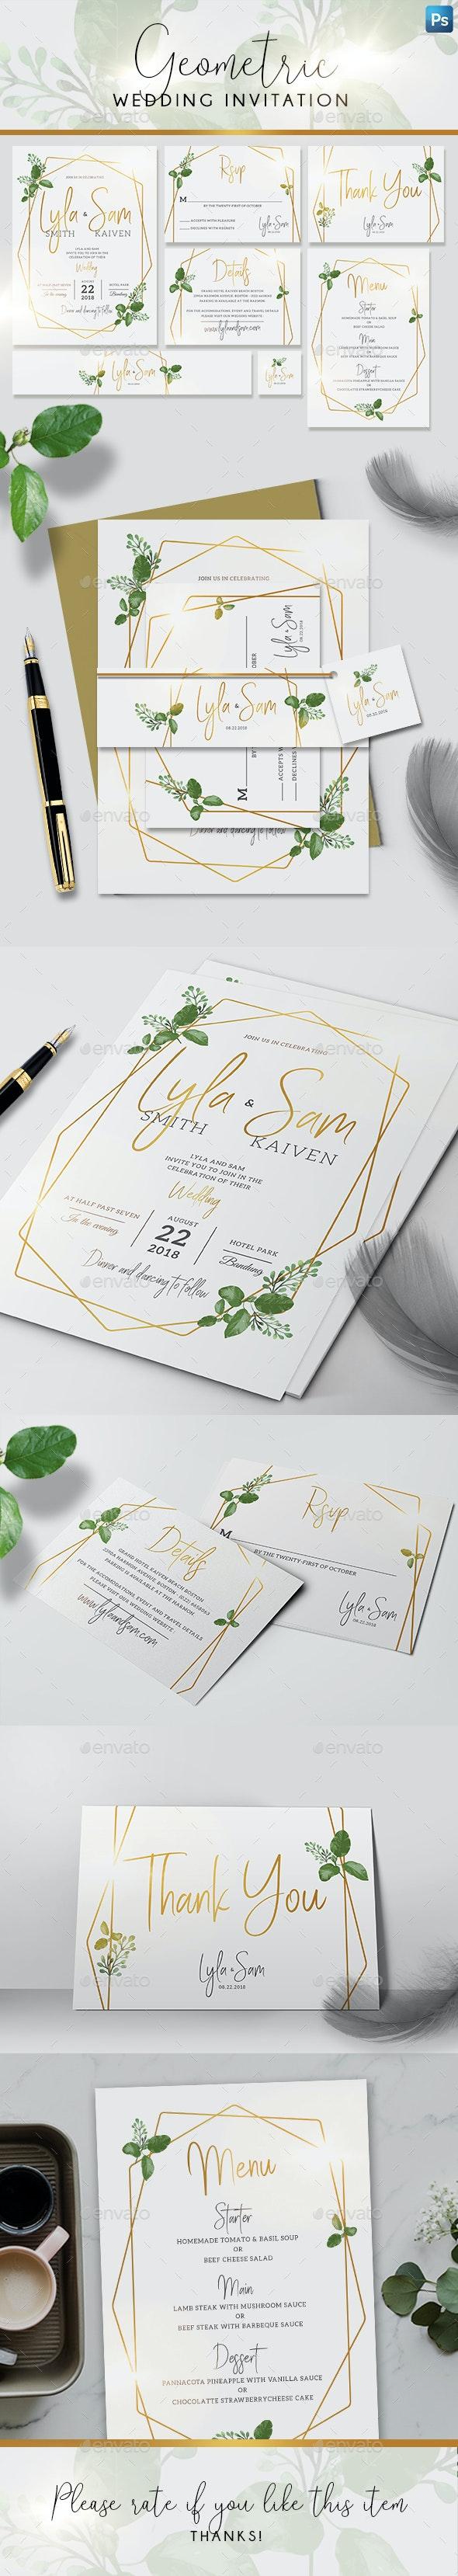 Geometric Wedding Invitation - Weddings Cards & Invites